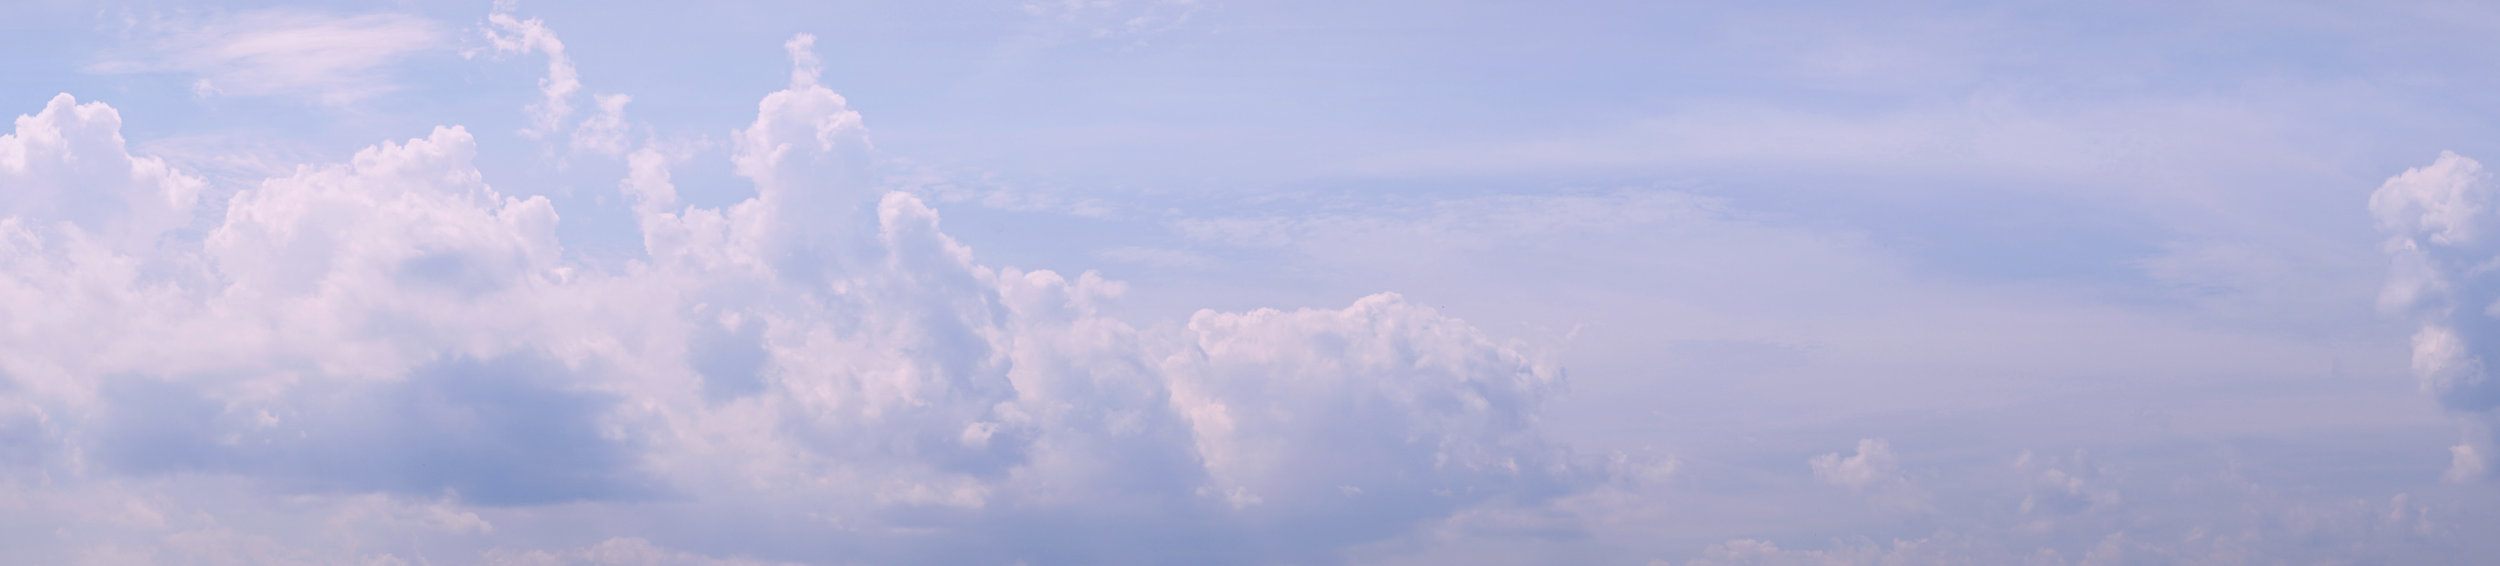 Clouds_Pano_v2.jpg